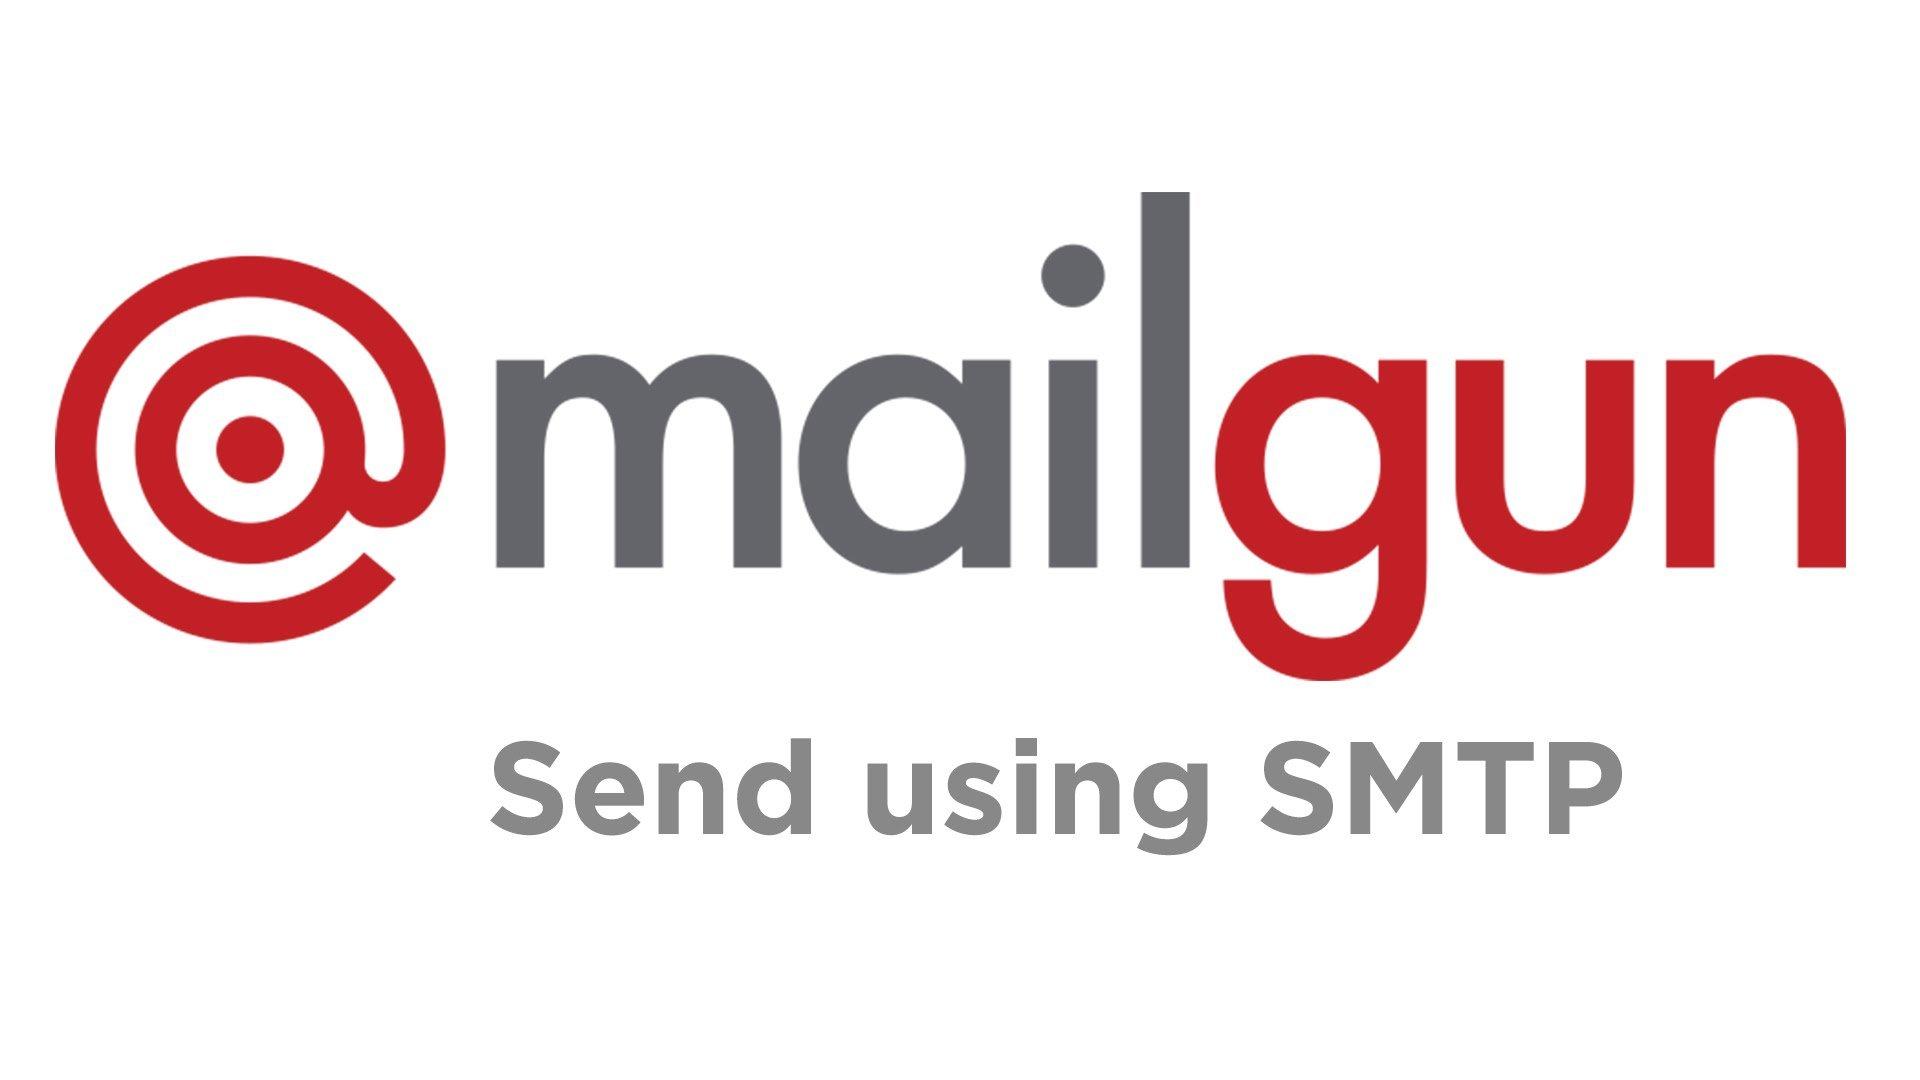 Gửi email trong laravel 5.4 sử dụng mailgun